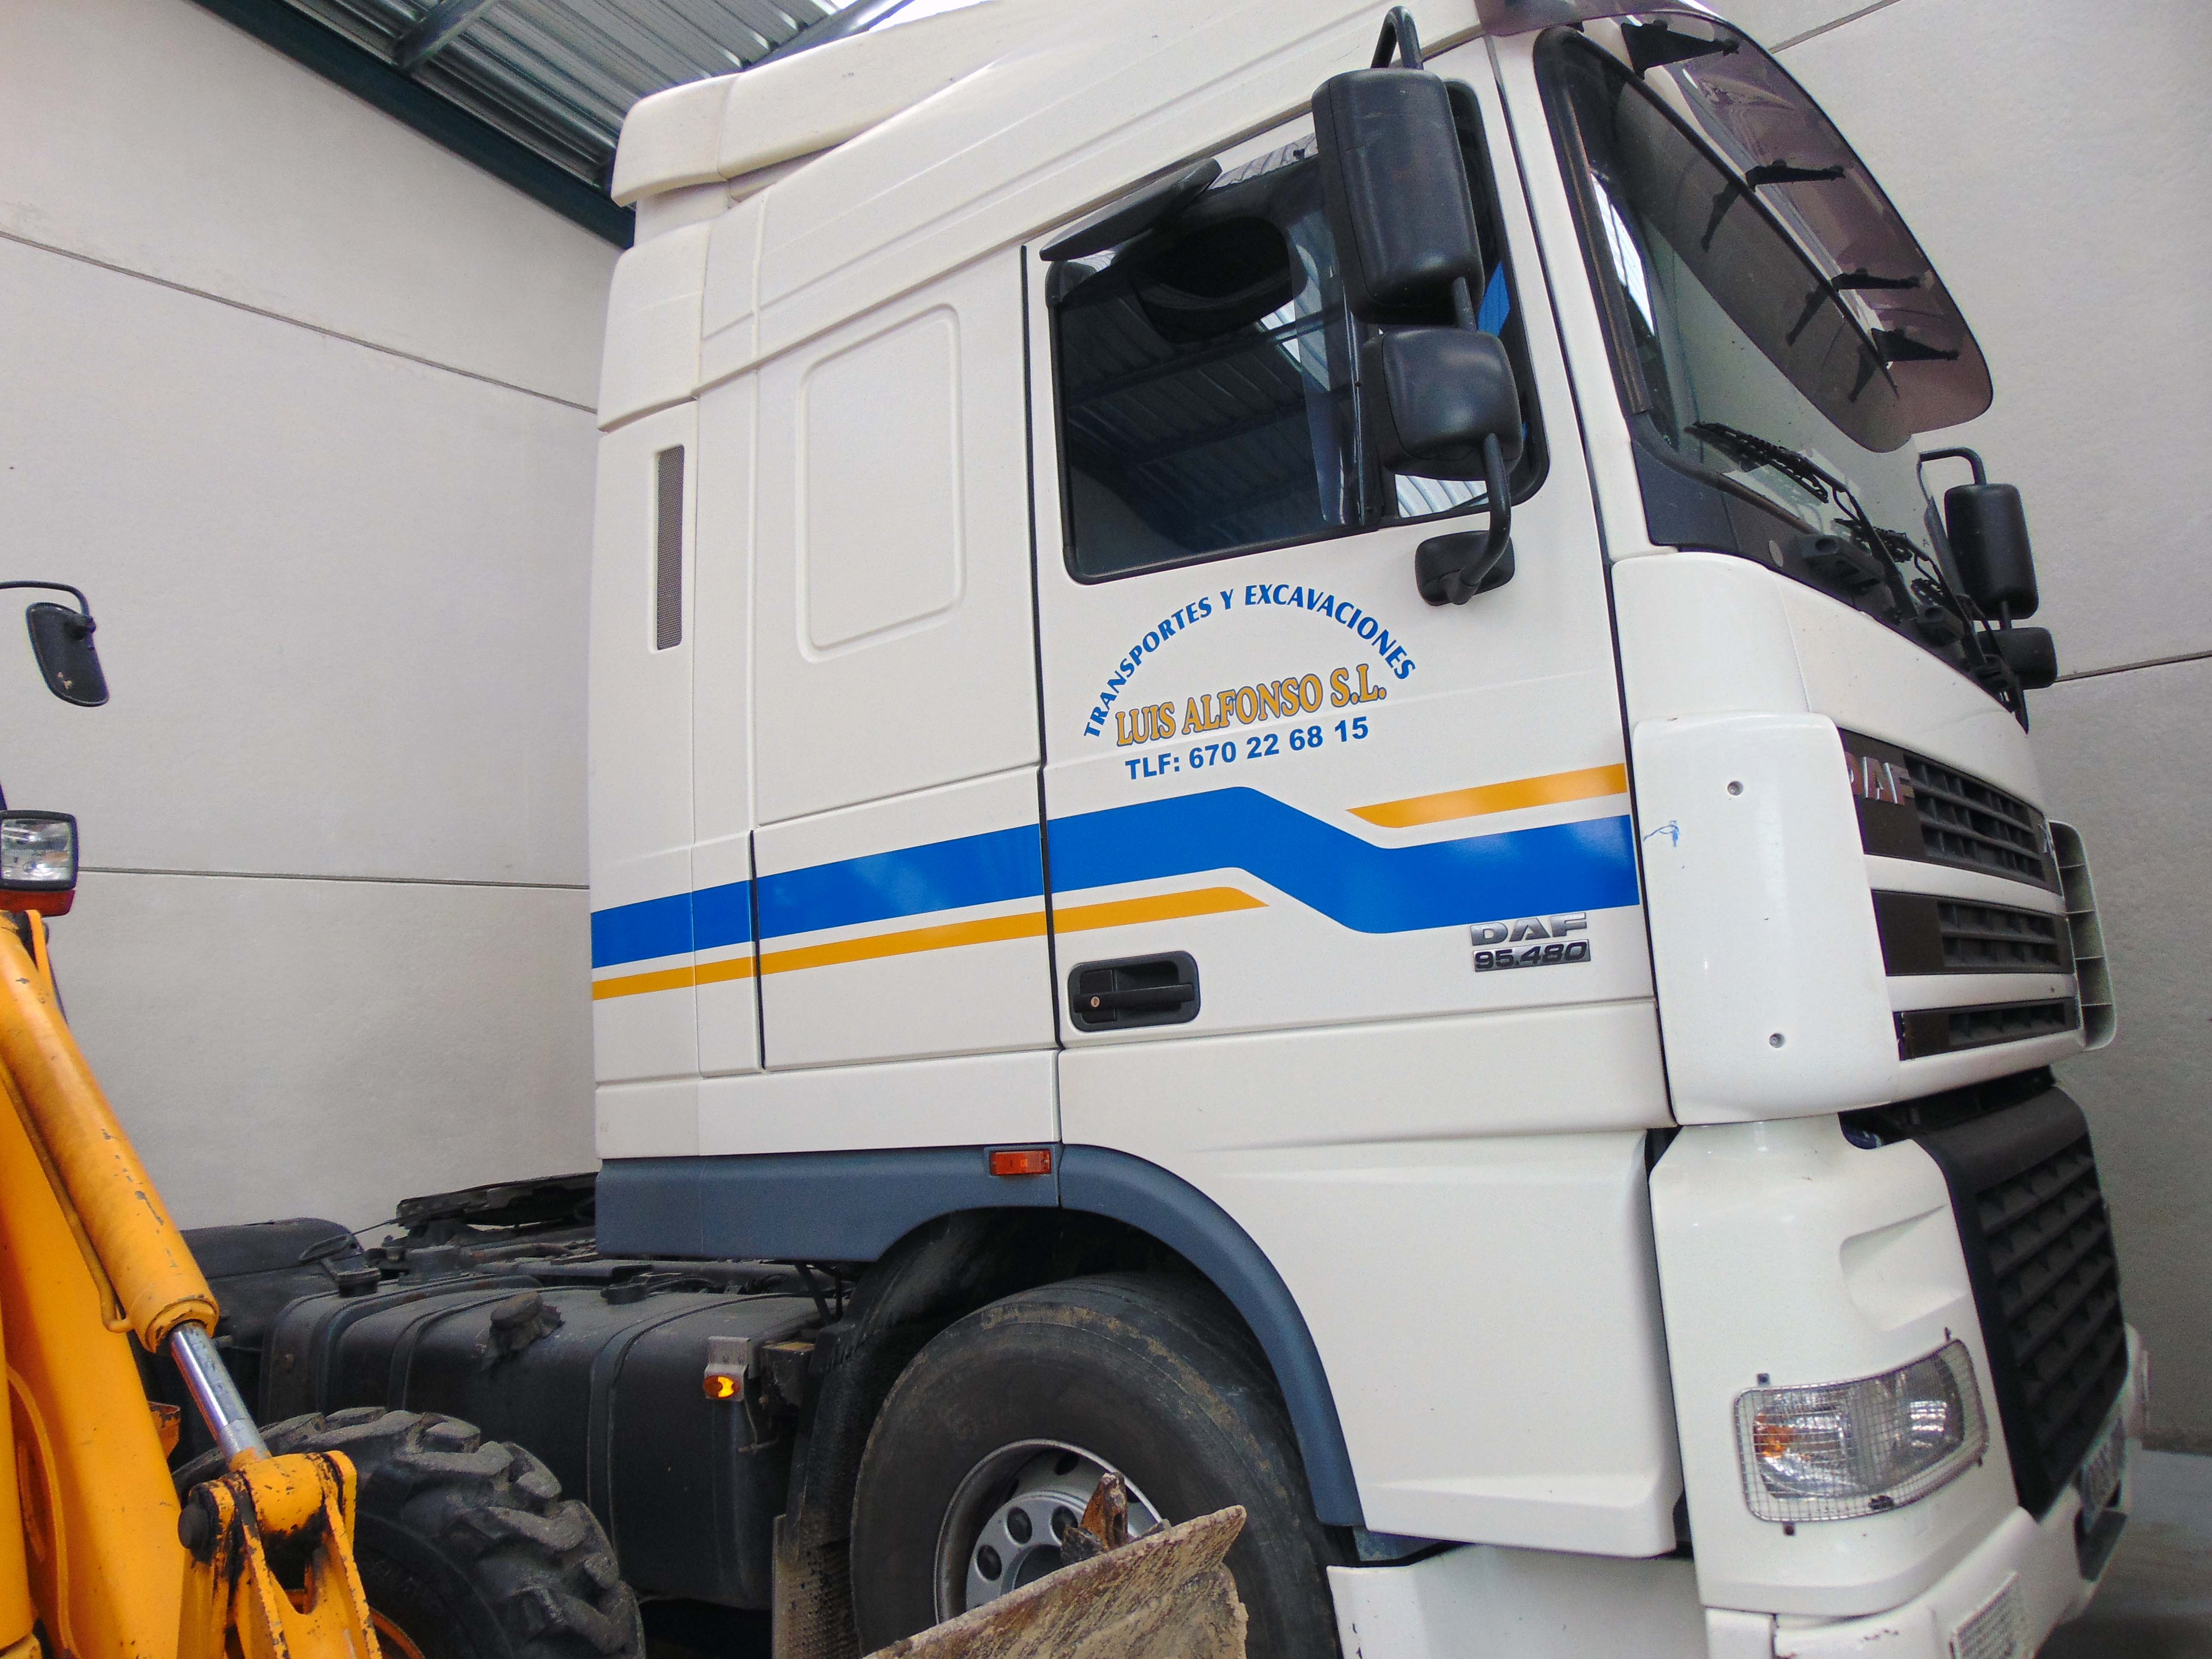 camiones para transporte